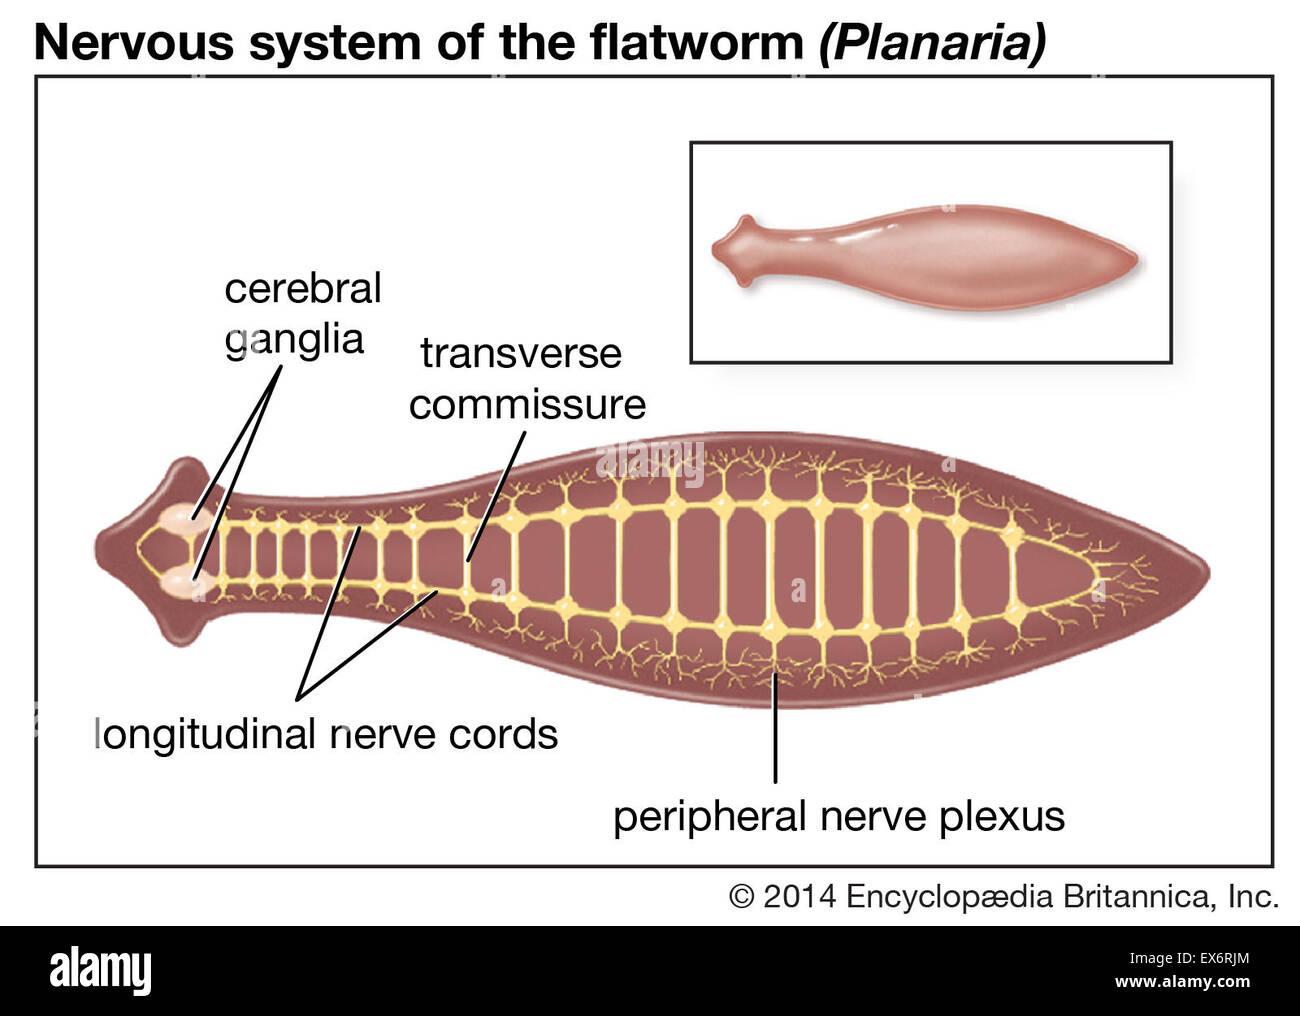 Nerves System Imágenes De Stock & Nerves System Fotos De Stock - Alamy